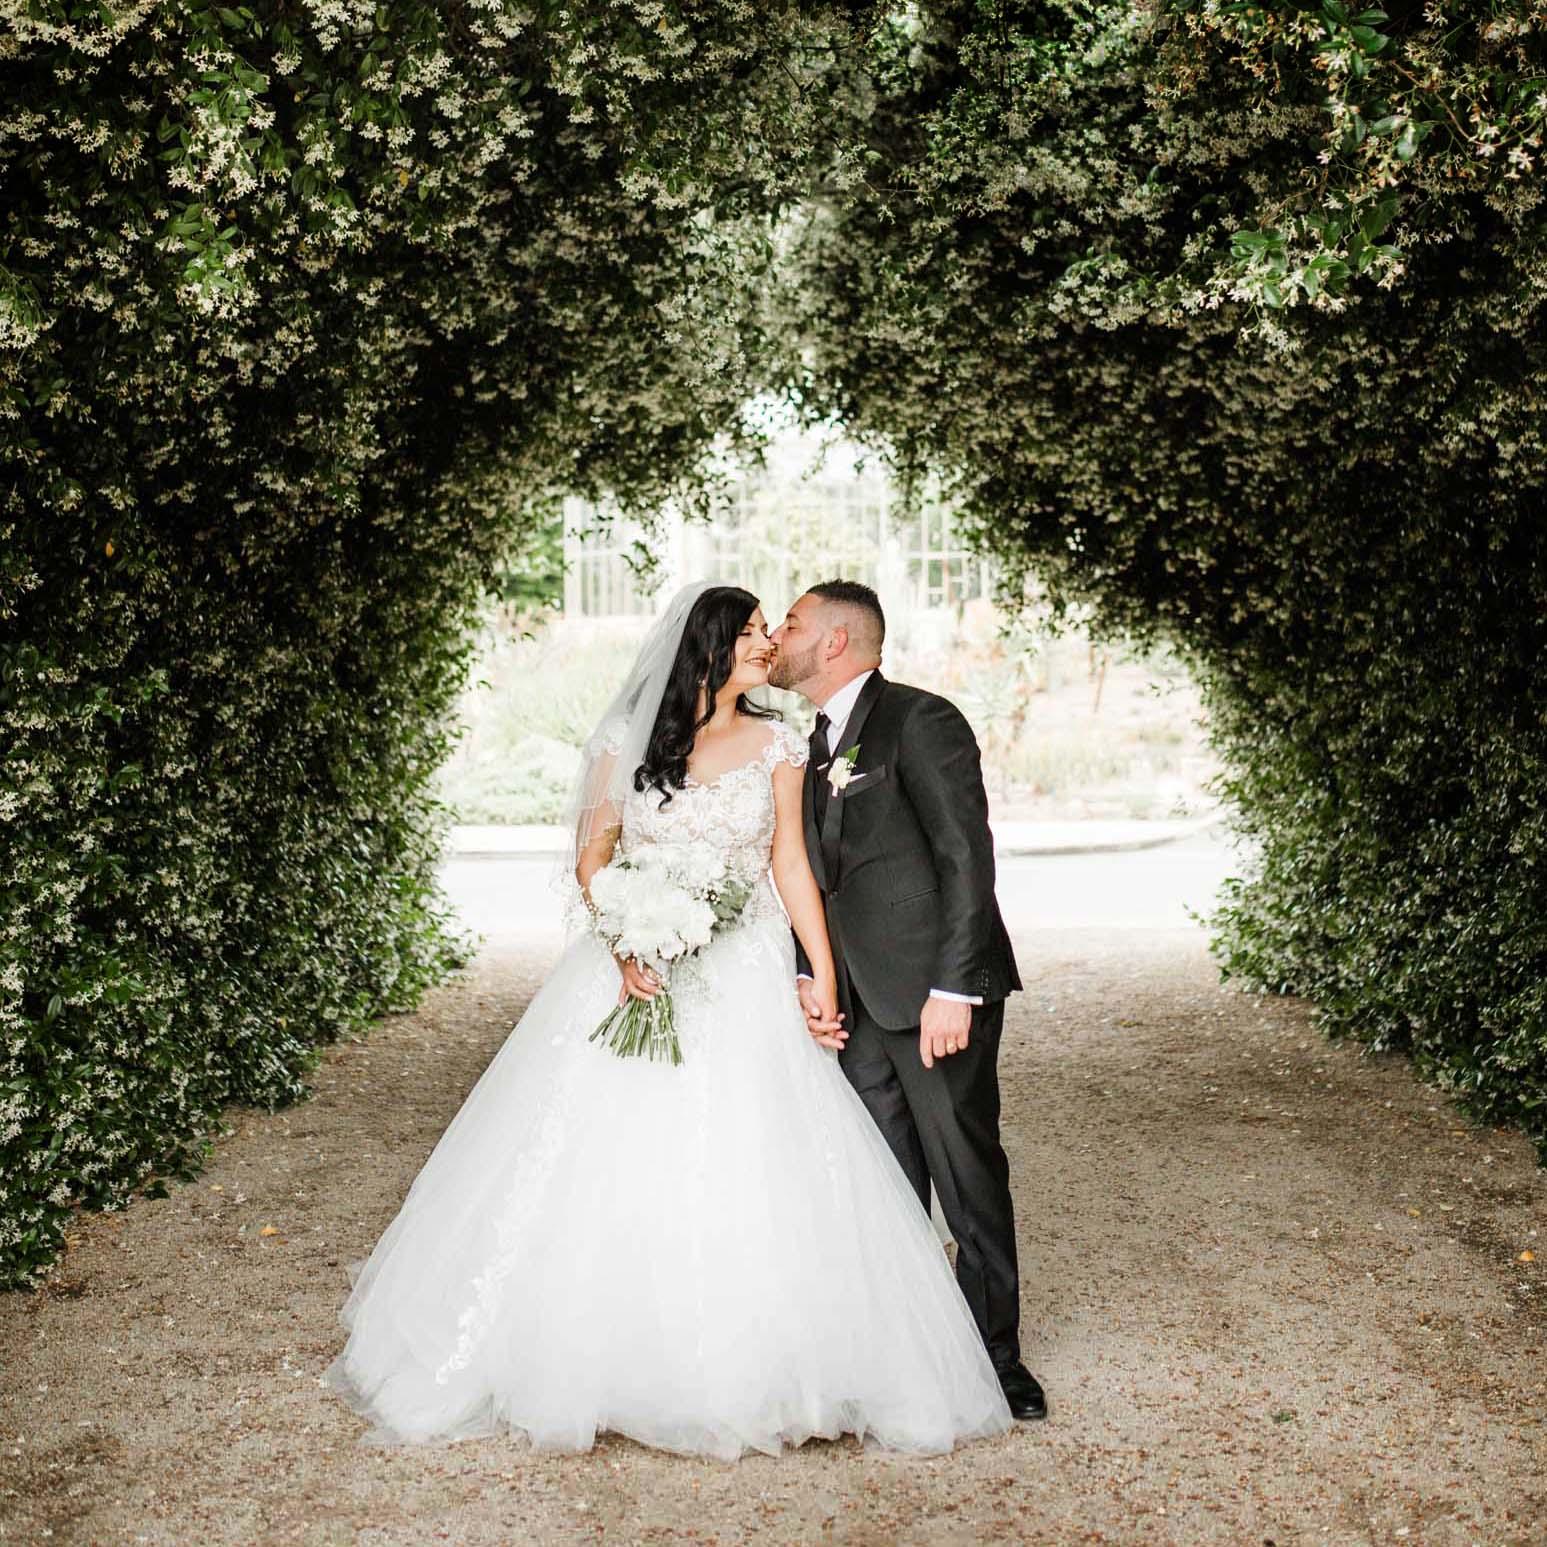 wedding adelaide sa pricing money cost.jpg